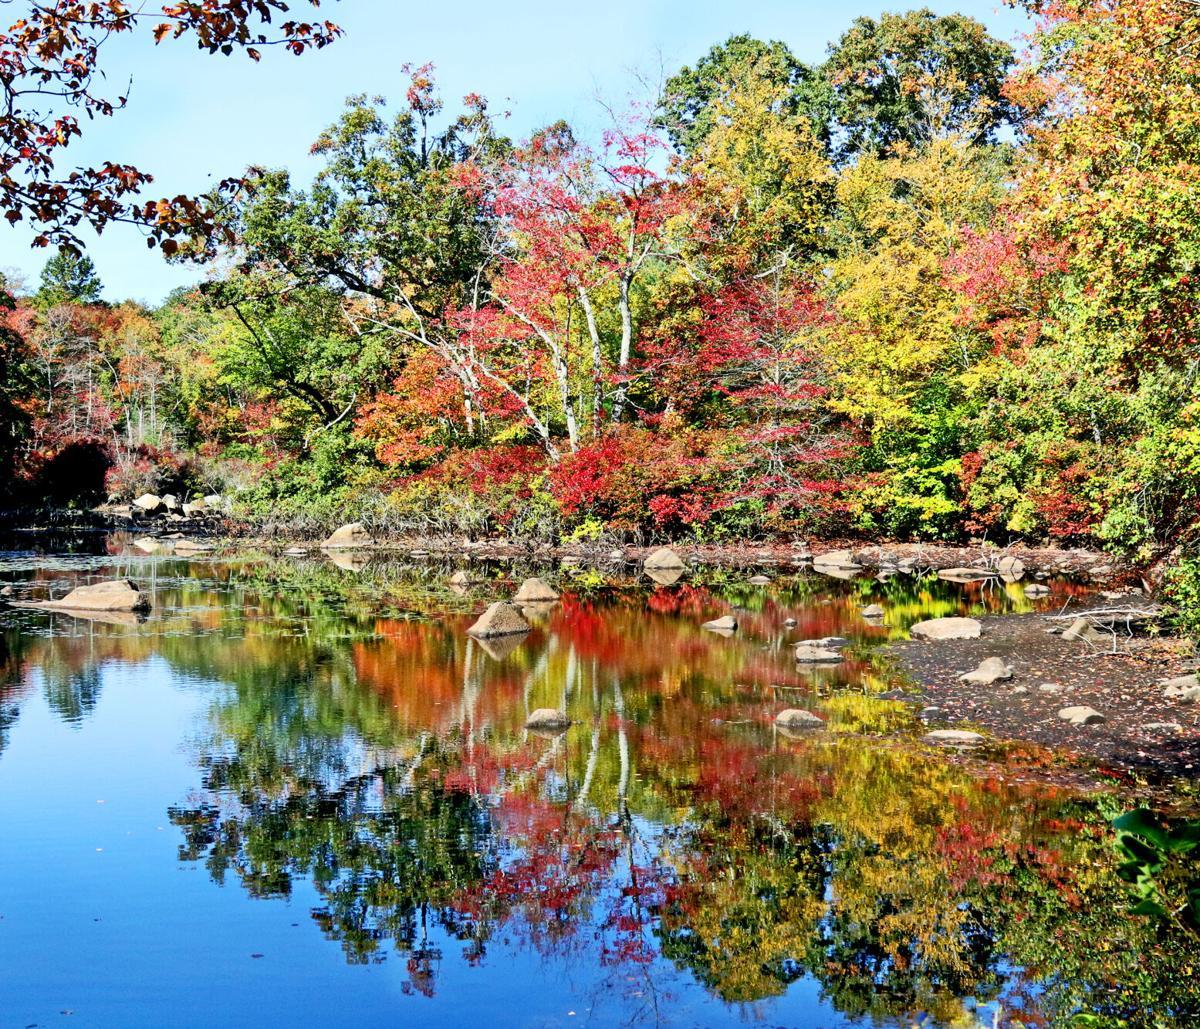 CHR Hope Valley autumn pond scene 11877.JPG